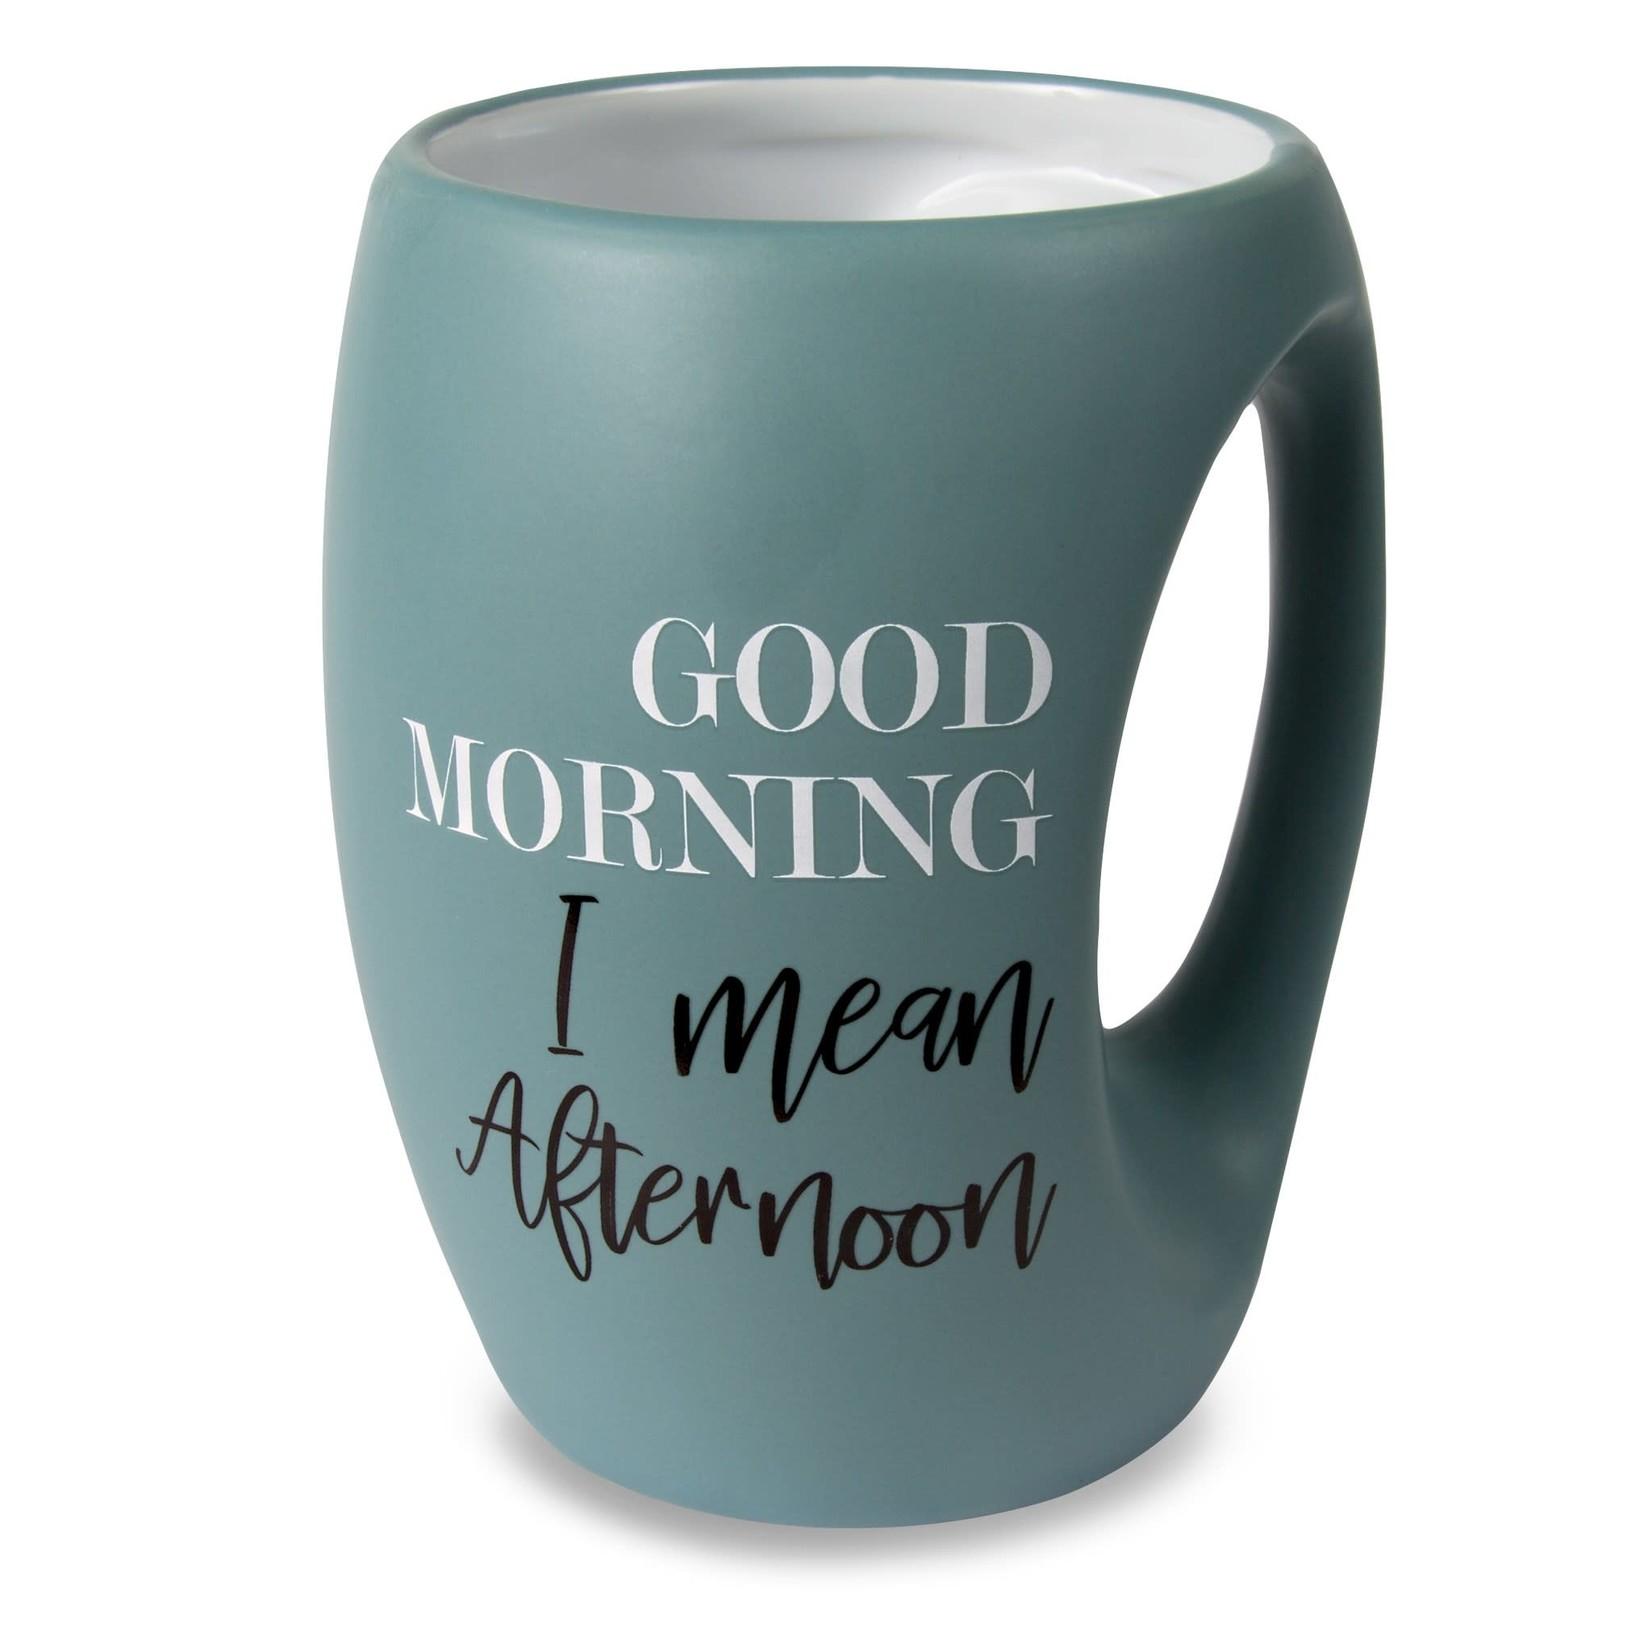 Mug - Afternoon - 16oz.